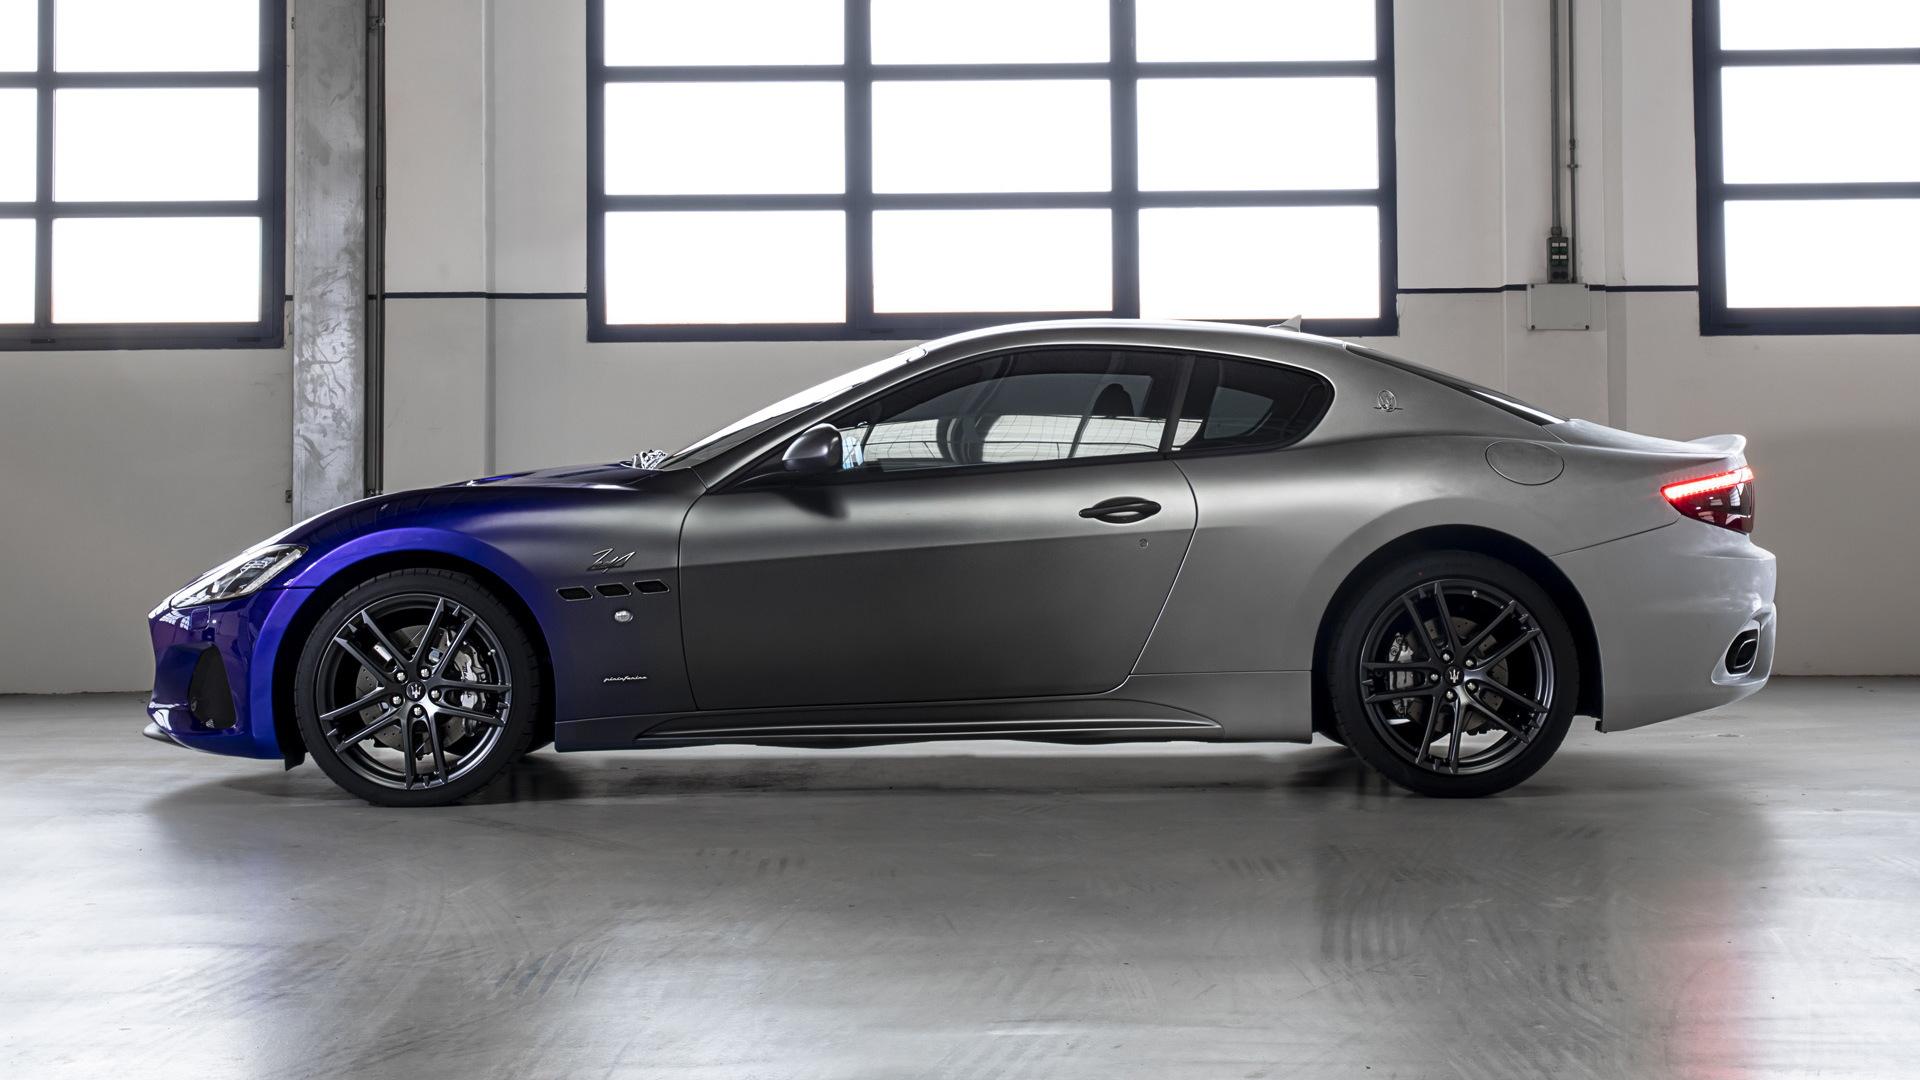 2019 Maserati GranTurismo Zeda